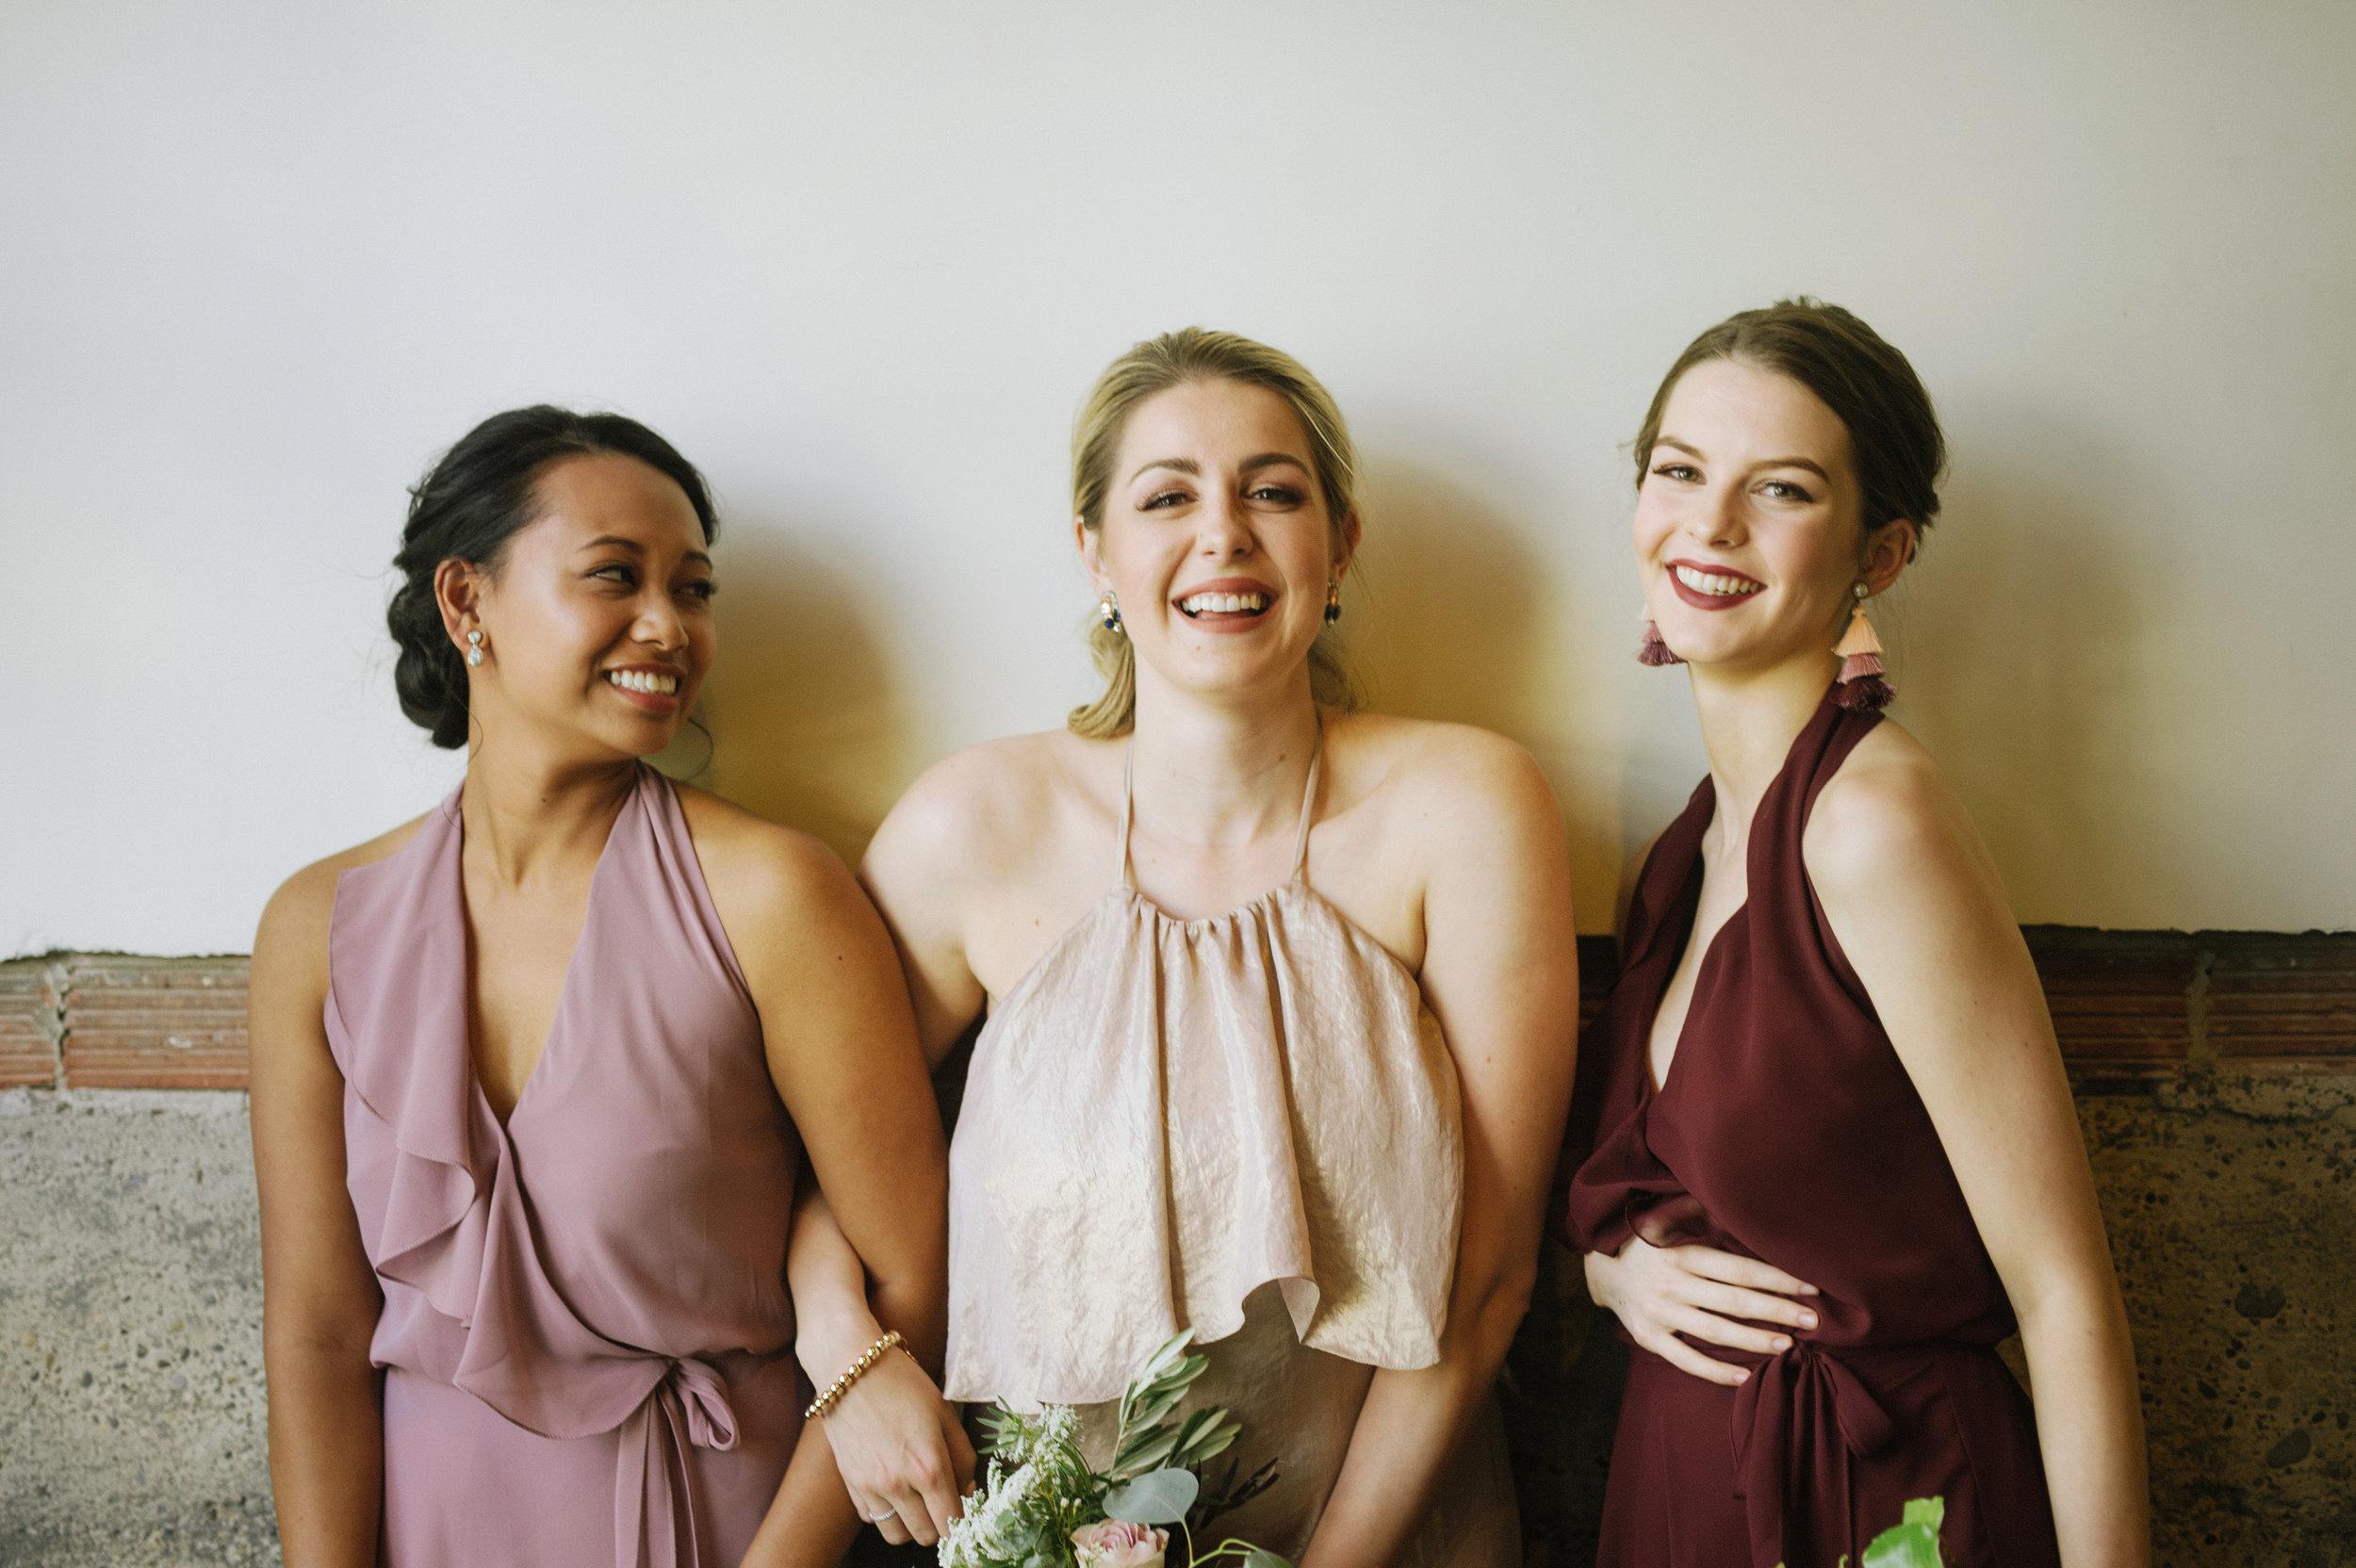 Calgary_Wedding_Photography_Bridgette_Bar_Bridesmaids_Shoot_2018_HR083.jpg